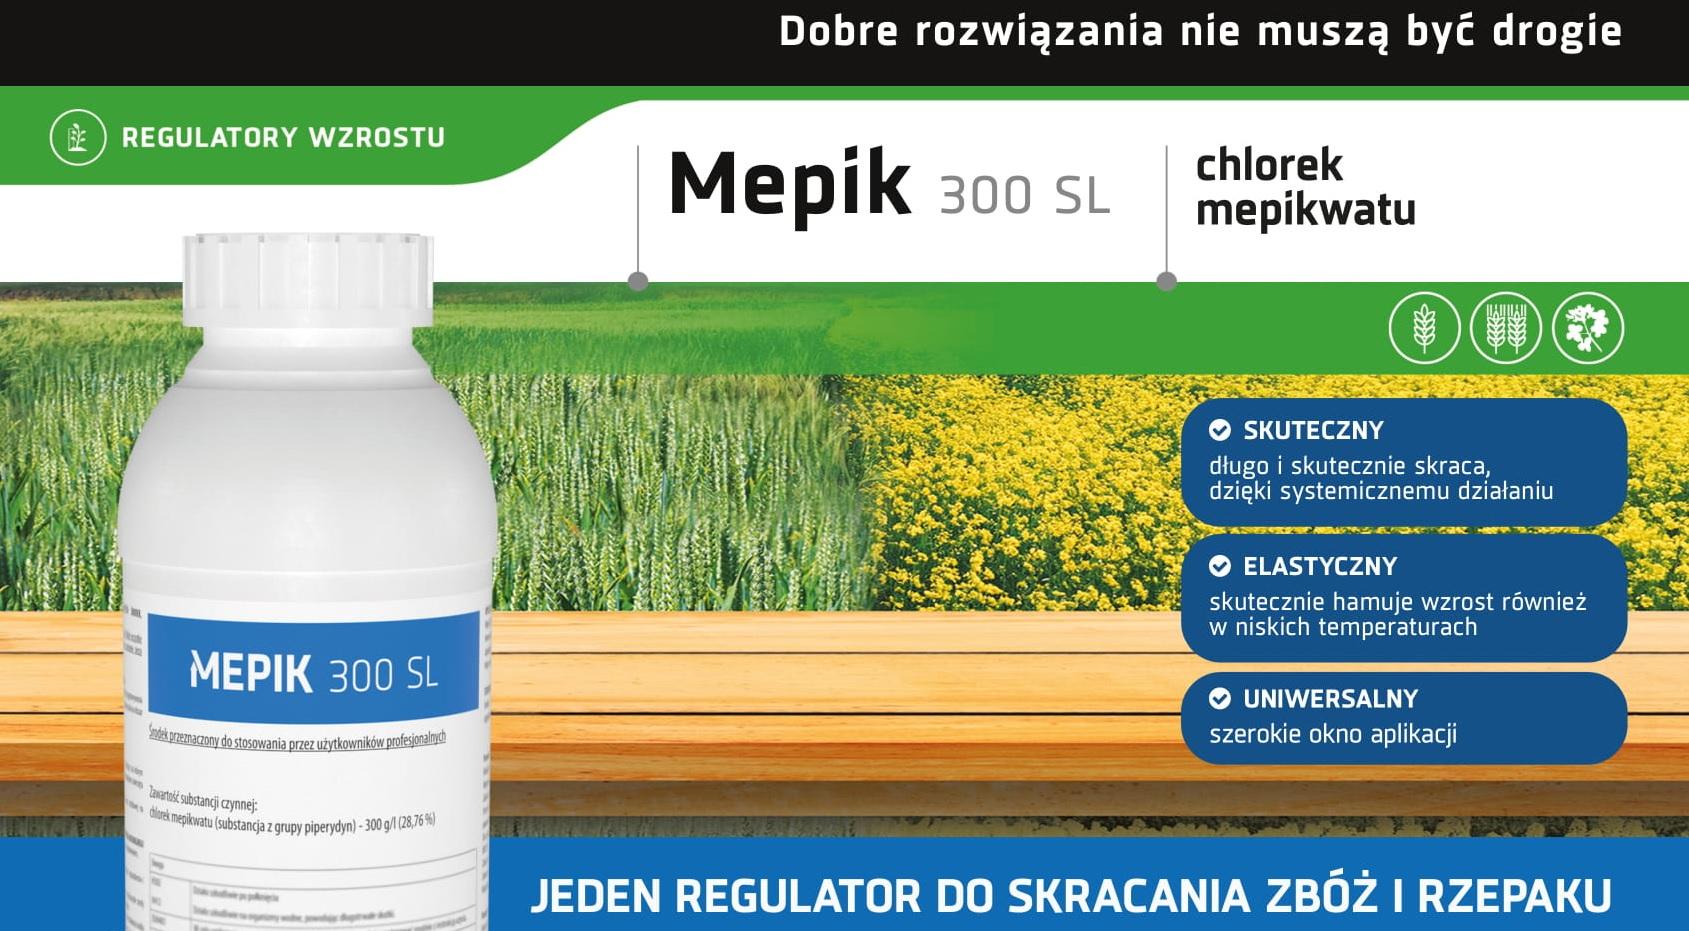 Mepik - regulator wzrostu